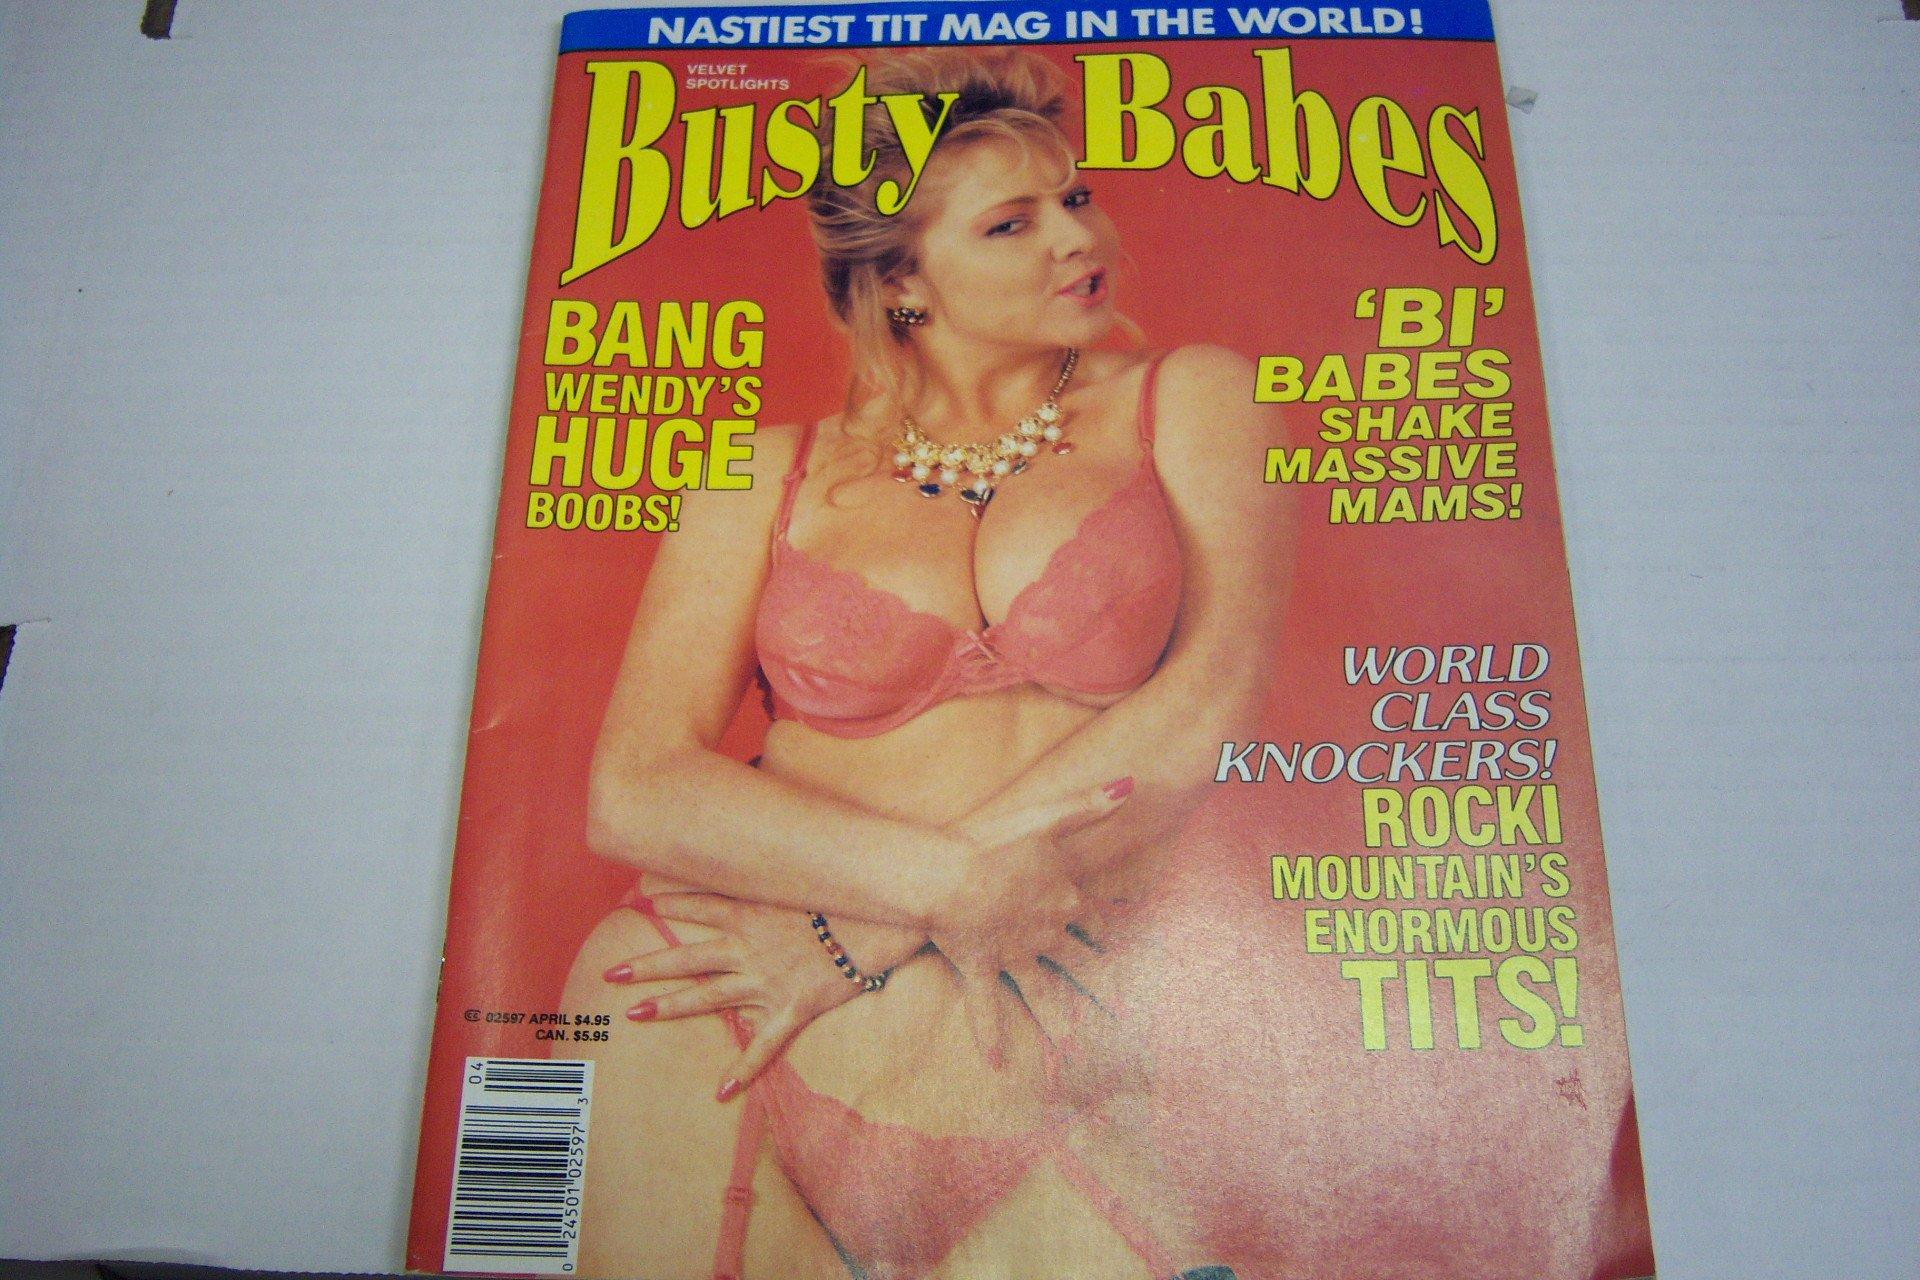 Aisleyne horgan wallace nude pics